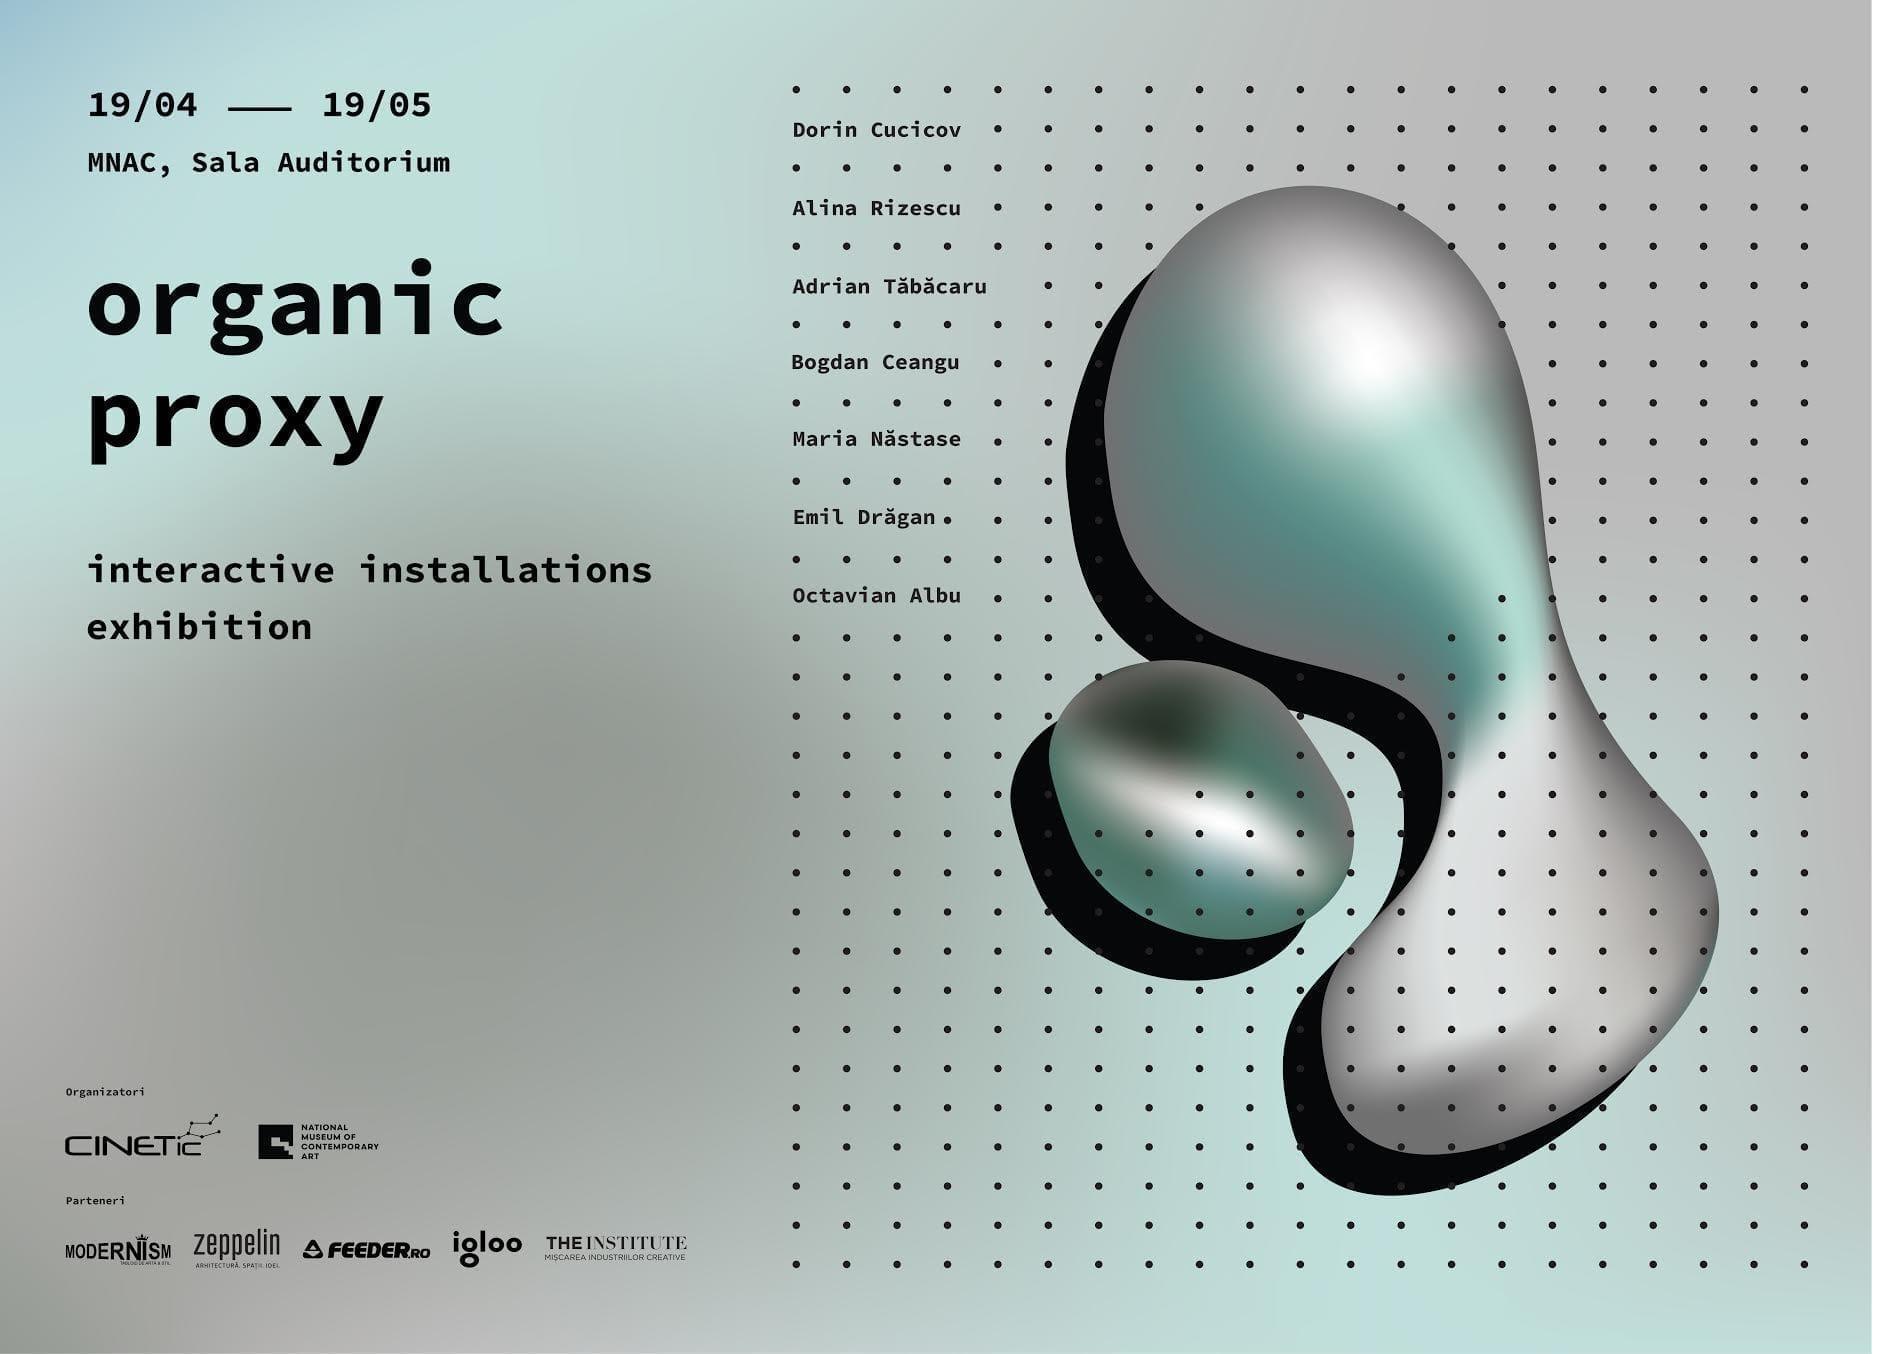 Organic Proxy - Expoziție de instalații interactive @ MNAC